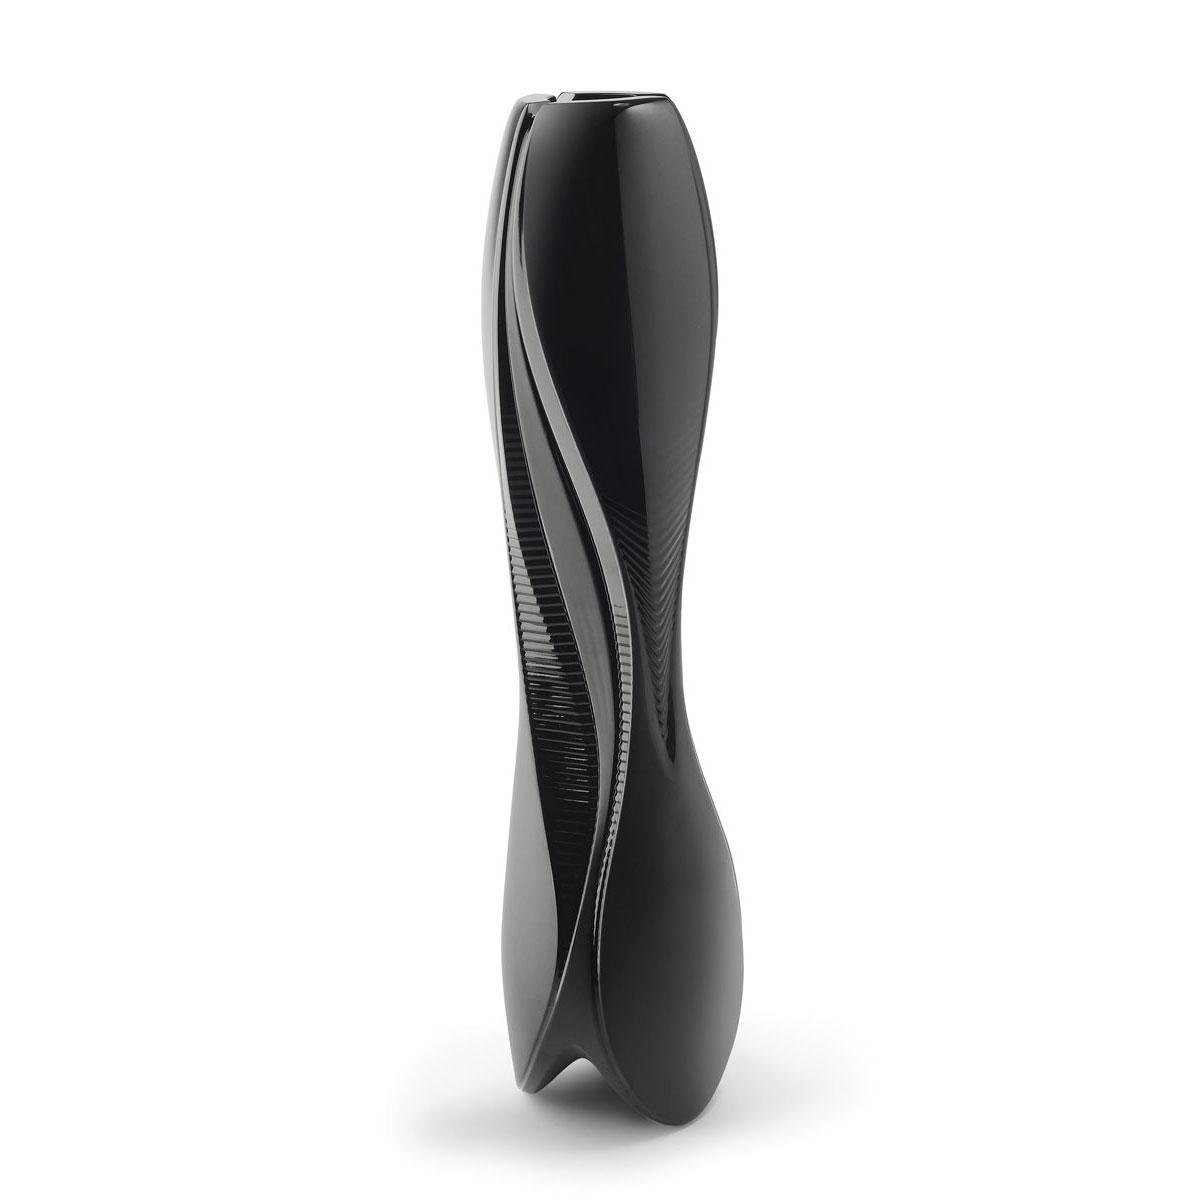 "Lalique Visio By Zaha Hadid 23"" Vase, Black"